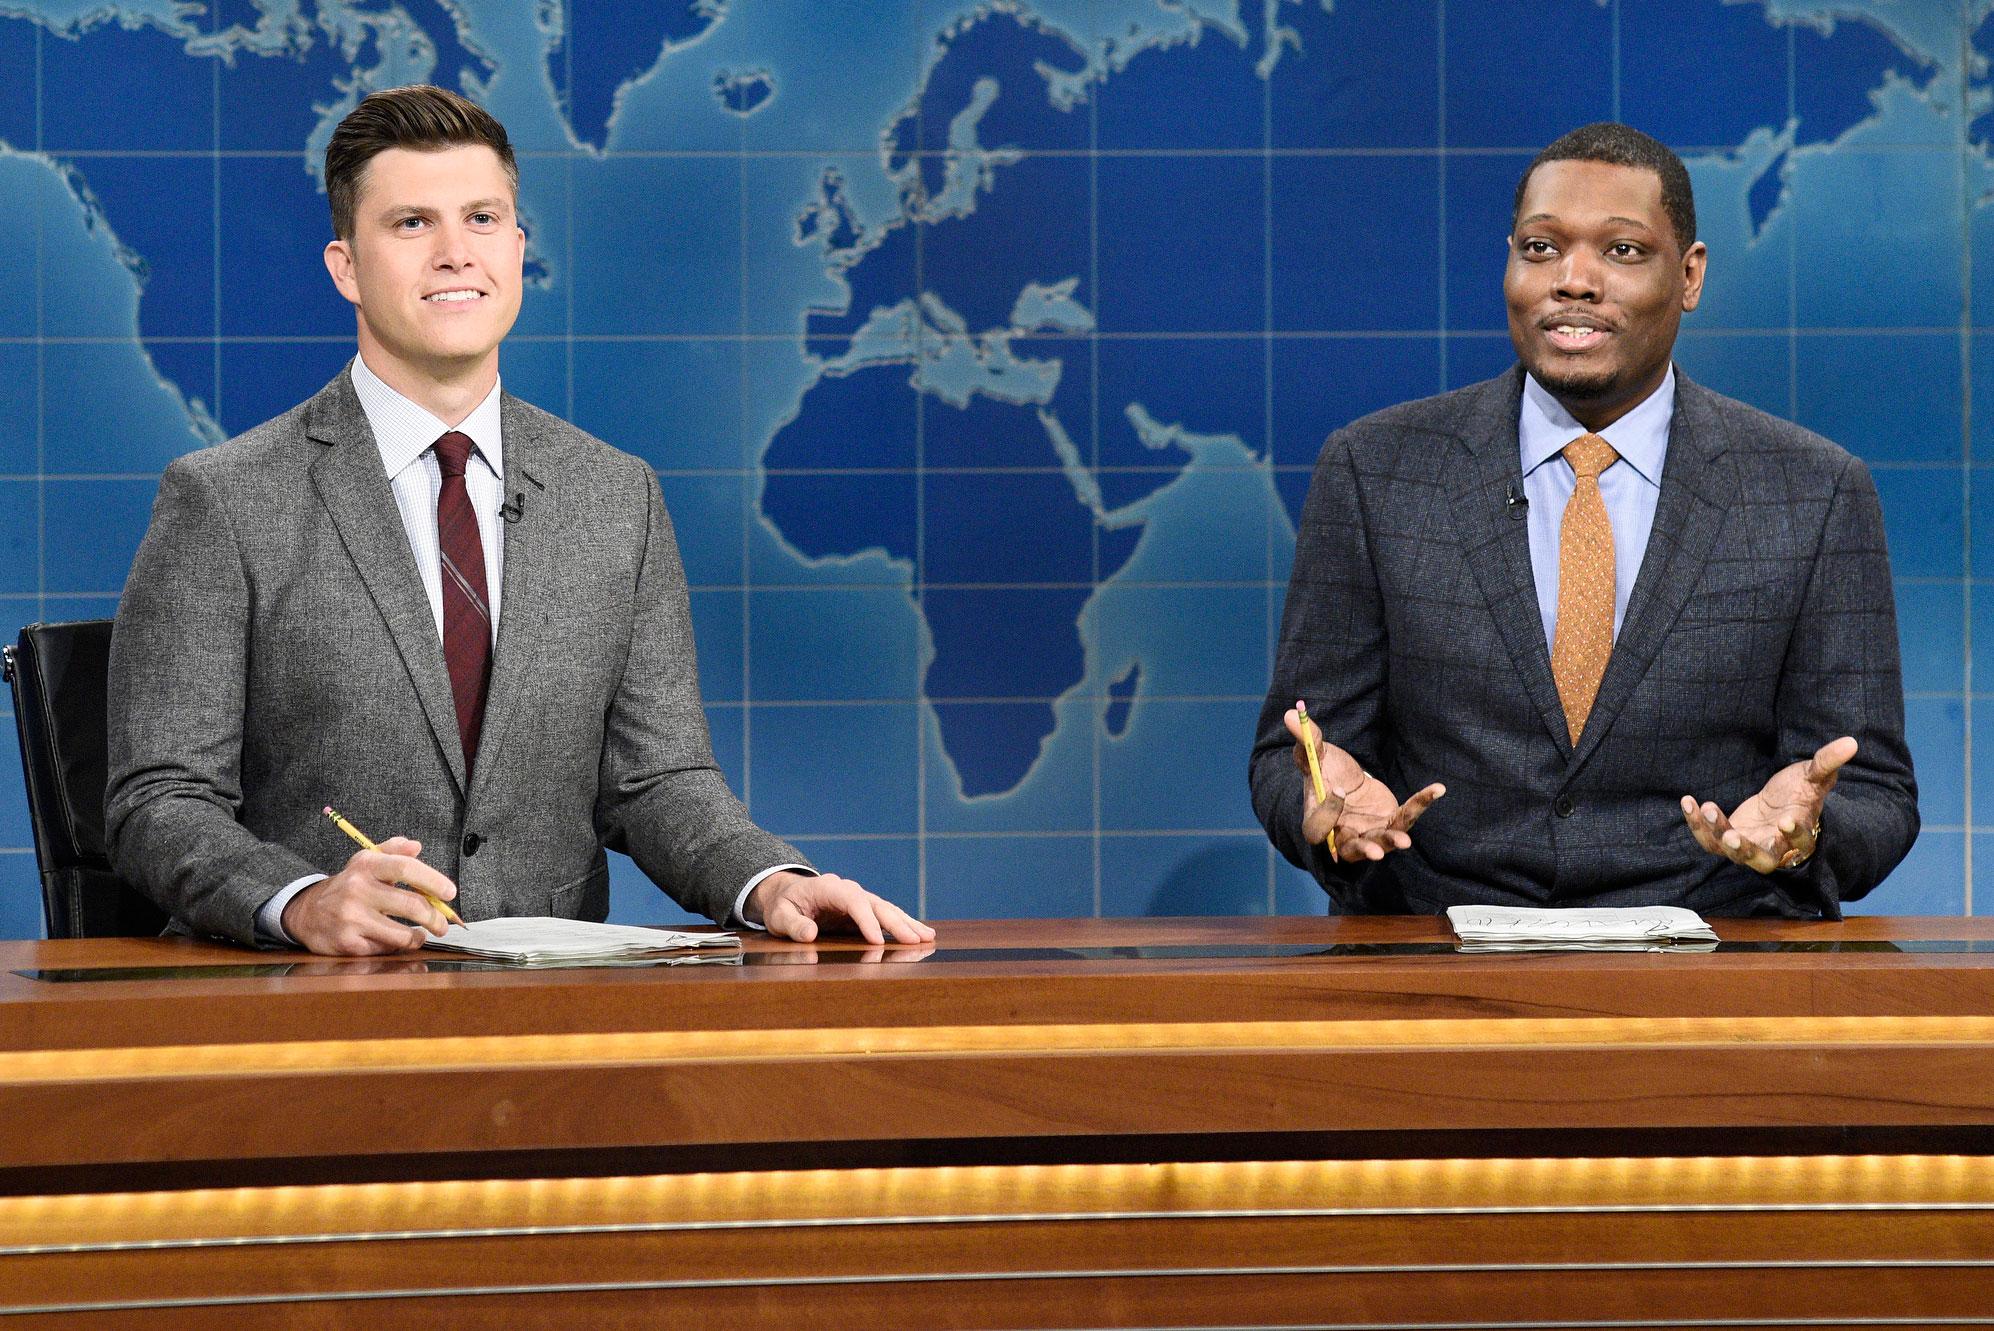 'Saturday Night Live': Colin Jost Calls Ryan Reynolds His Best Friend, Will Ferrell Fangirls Over Blake Lively